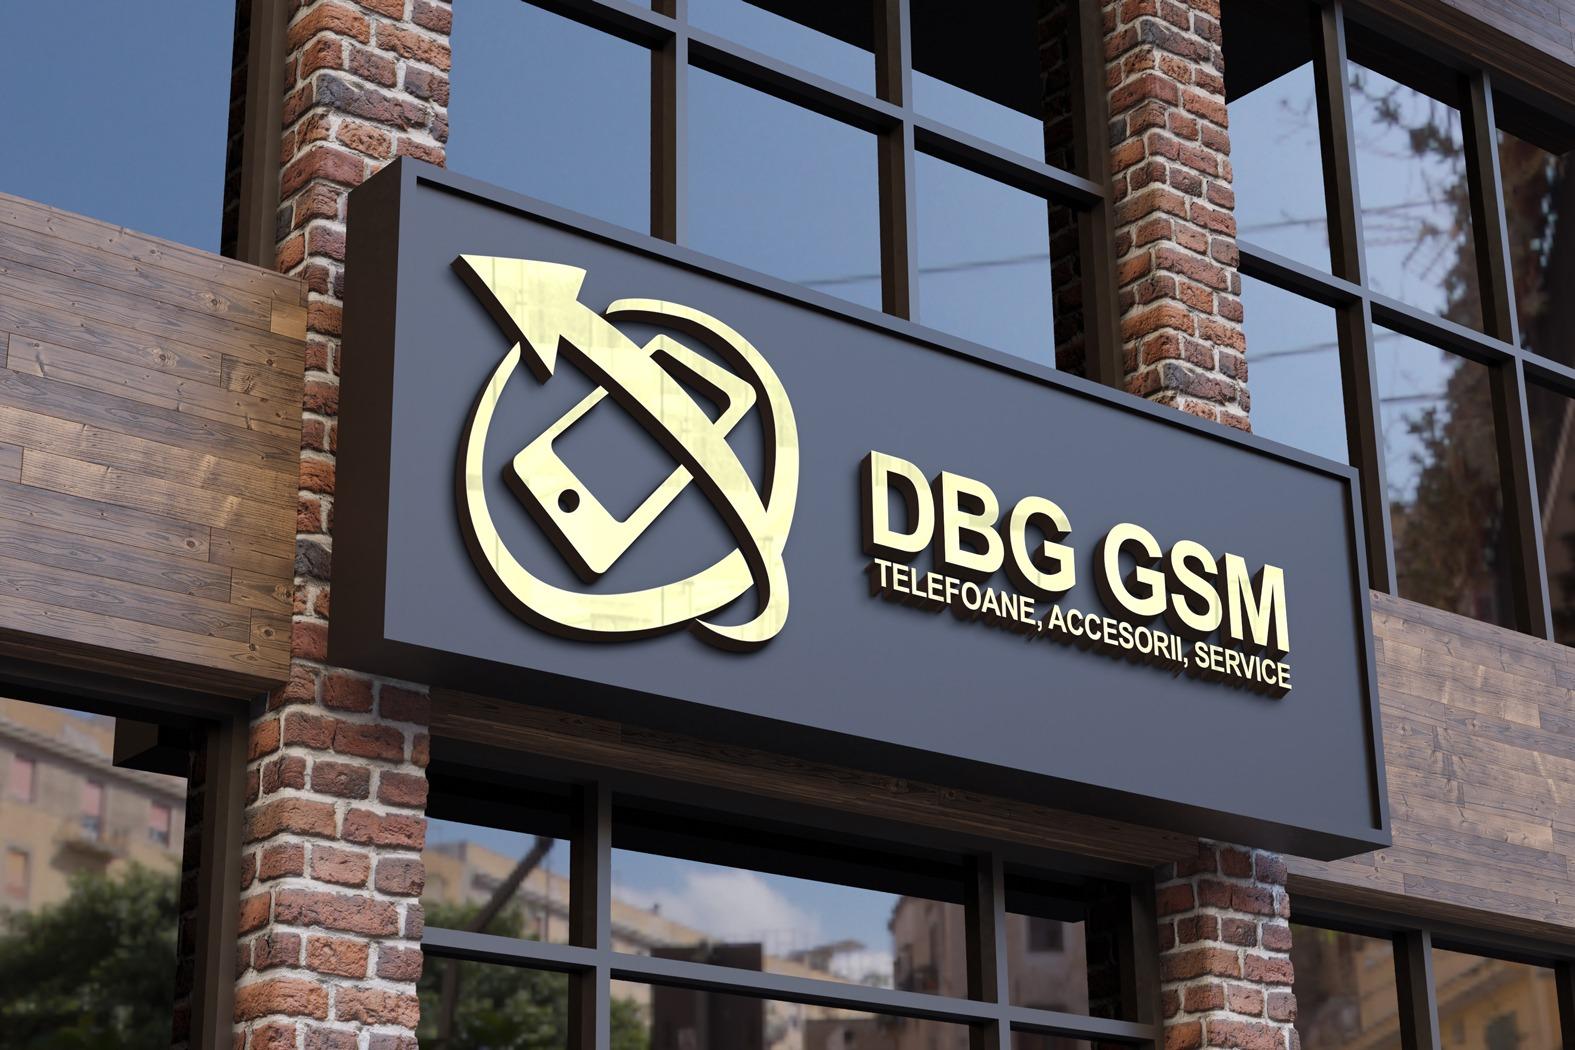 DBG GSM